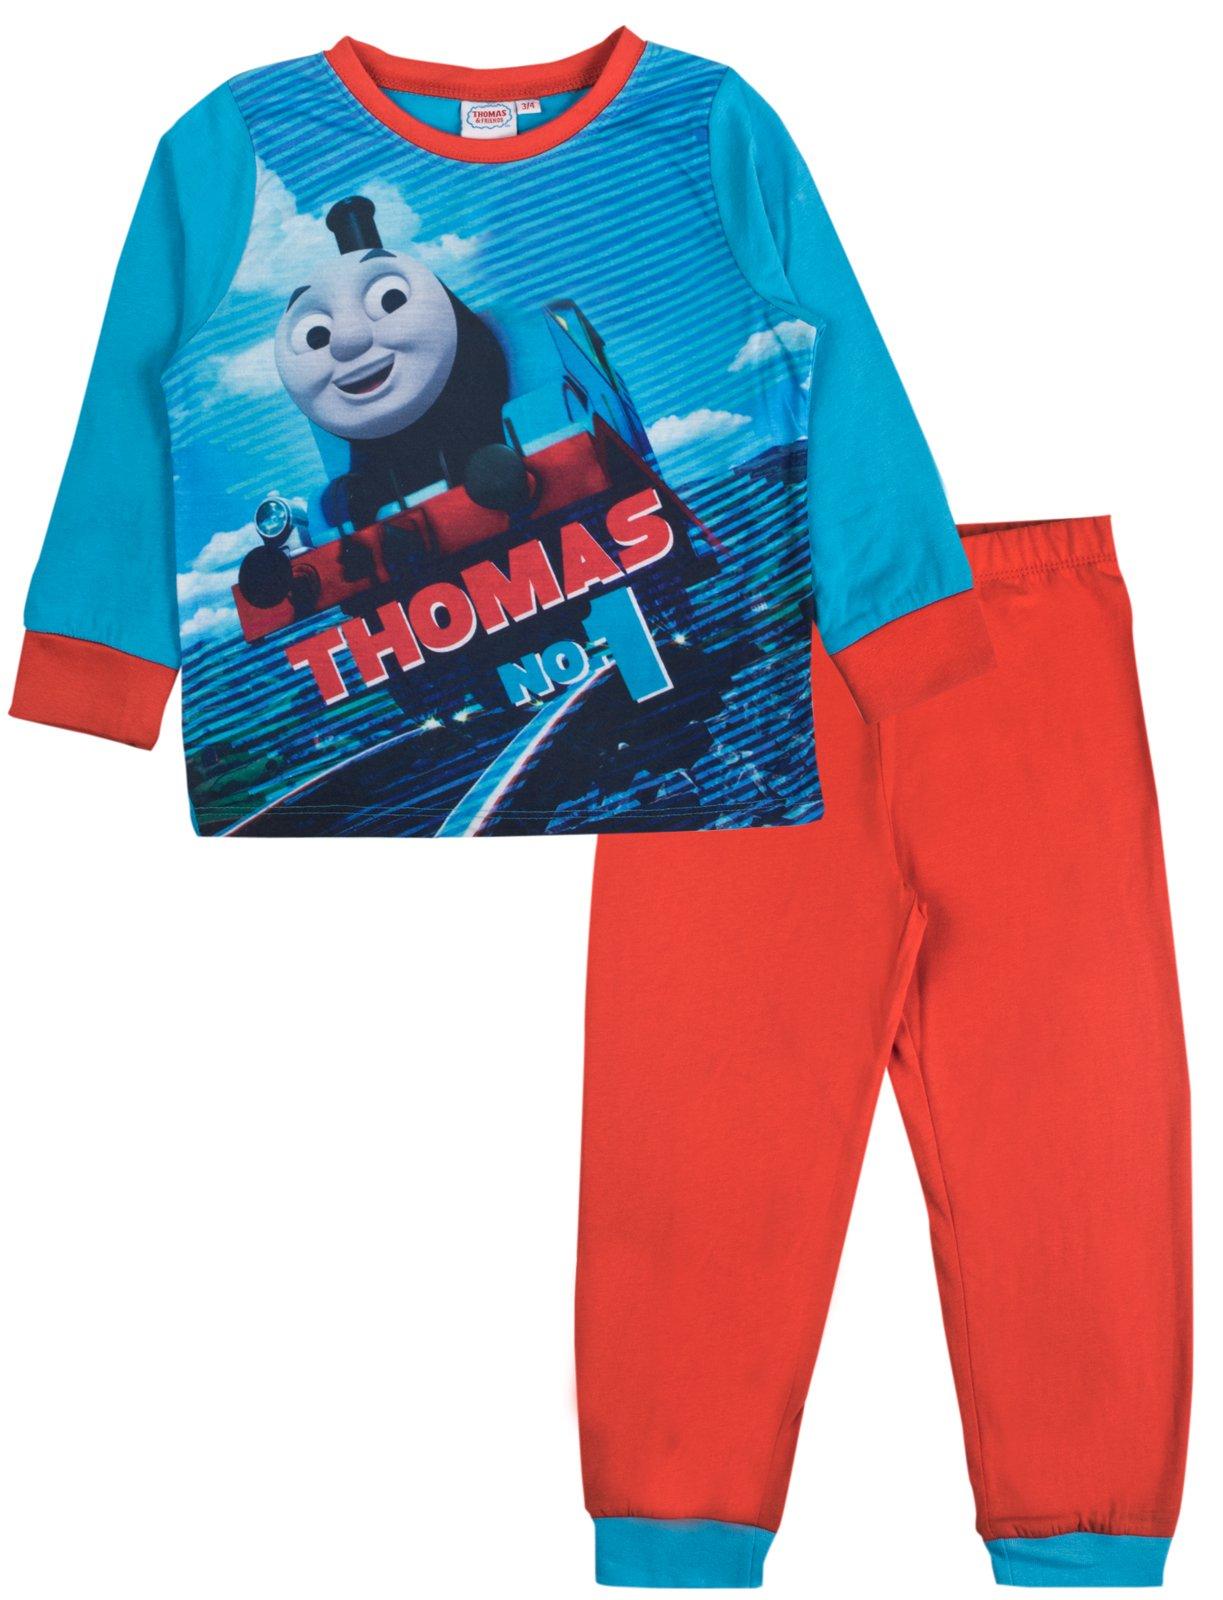 Boys Thomas  Pyjamas PJs Night Wear Sleepwear Flat Packed